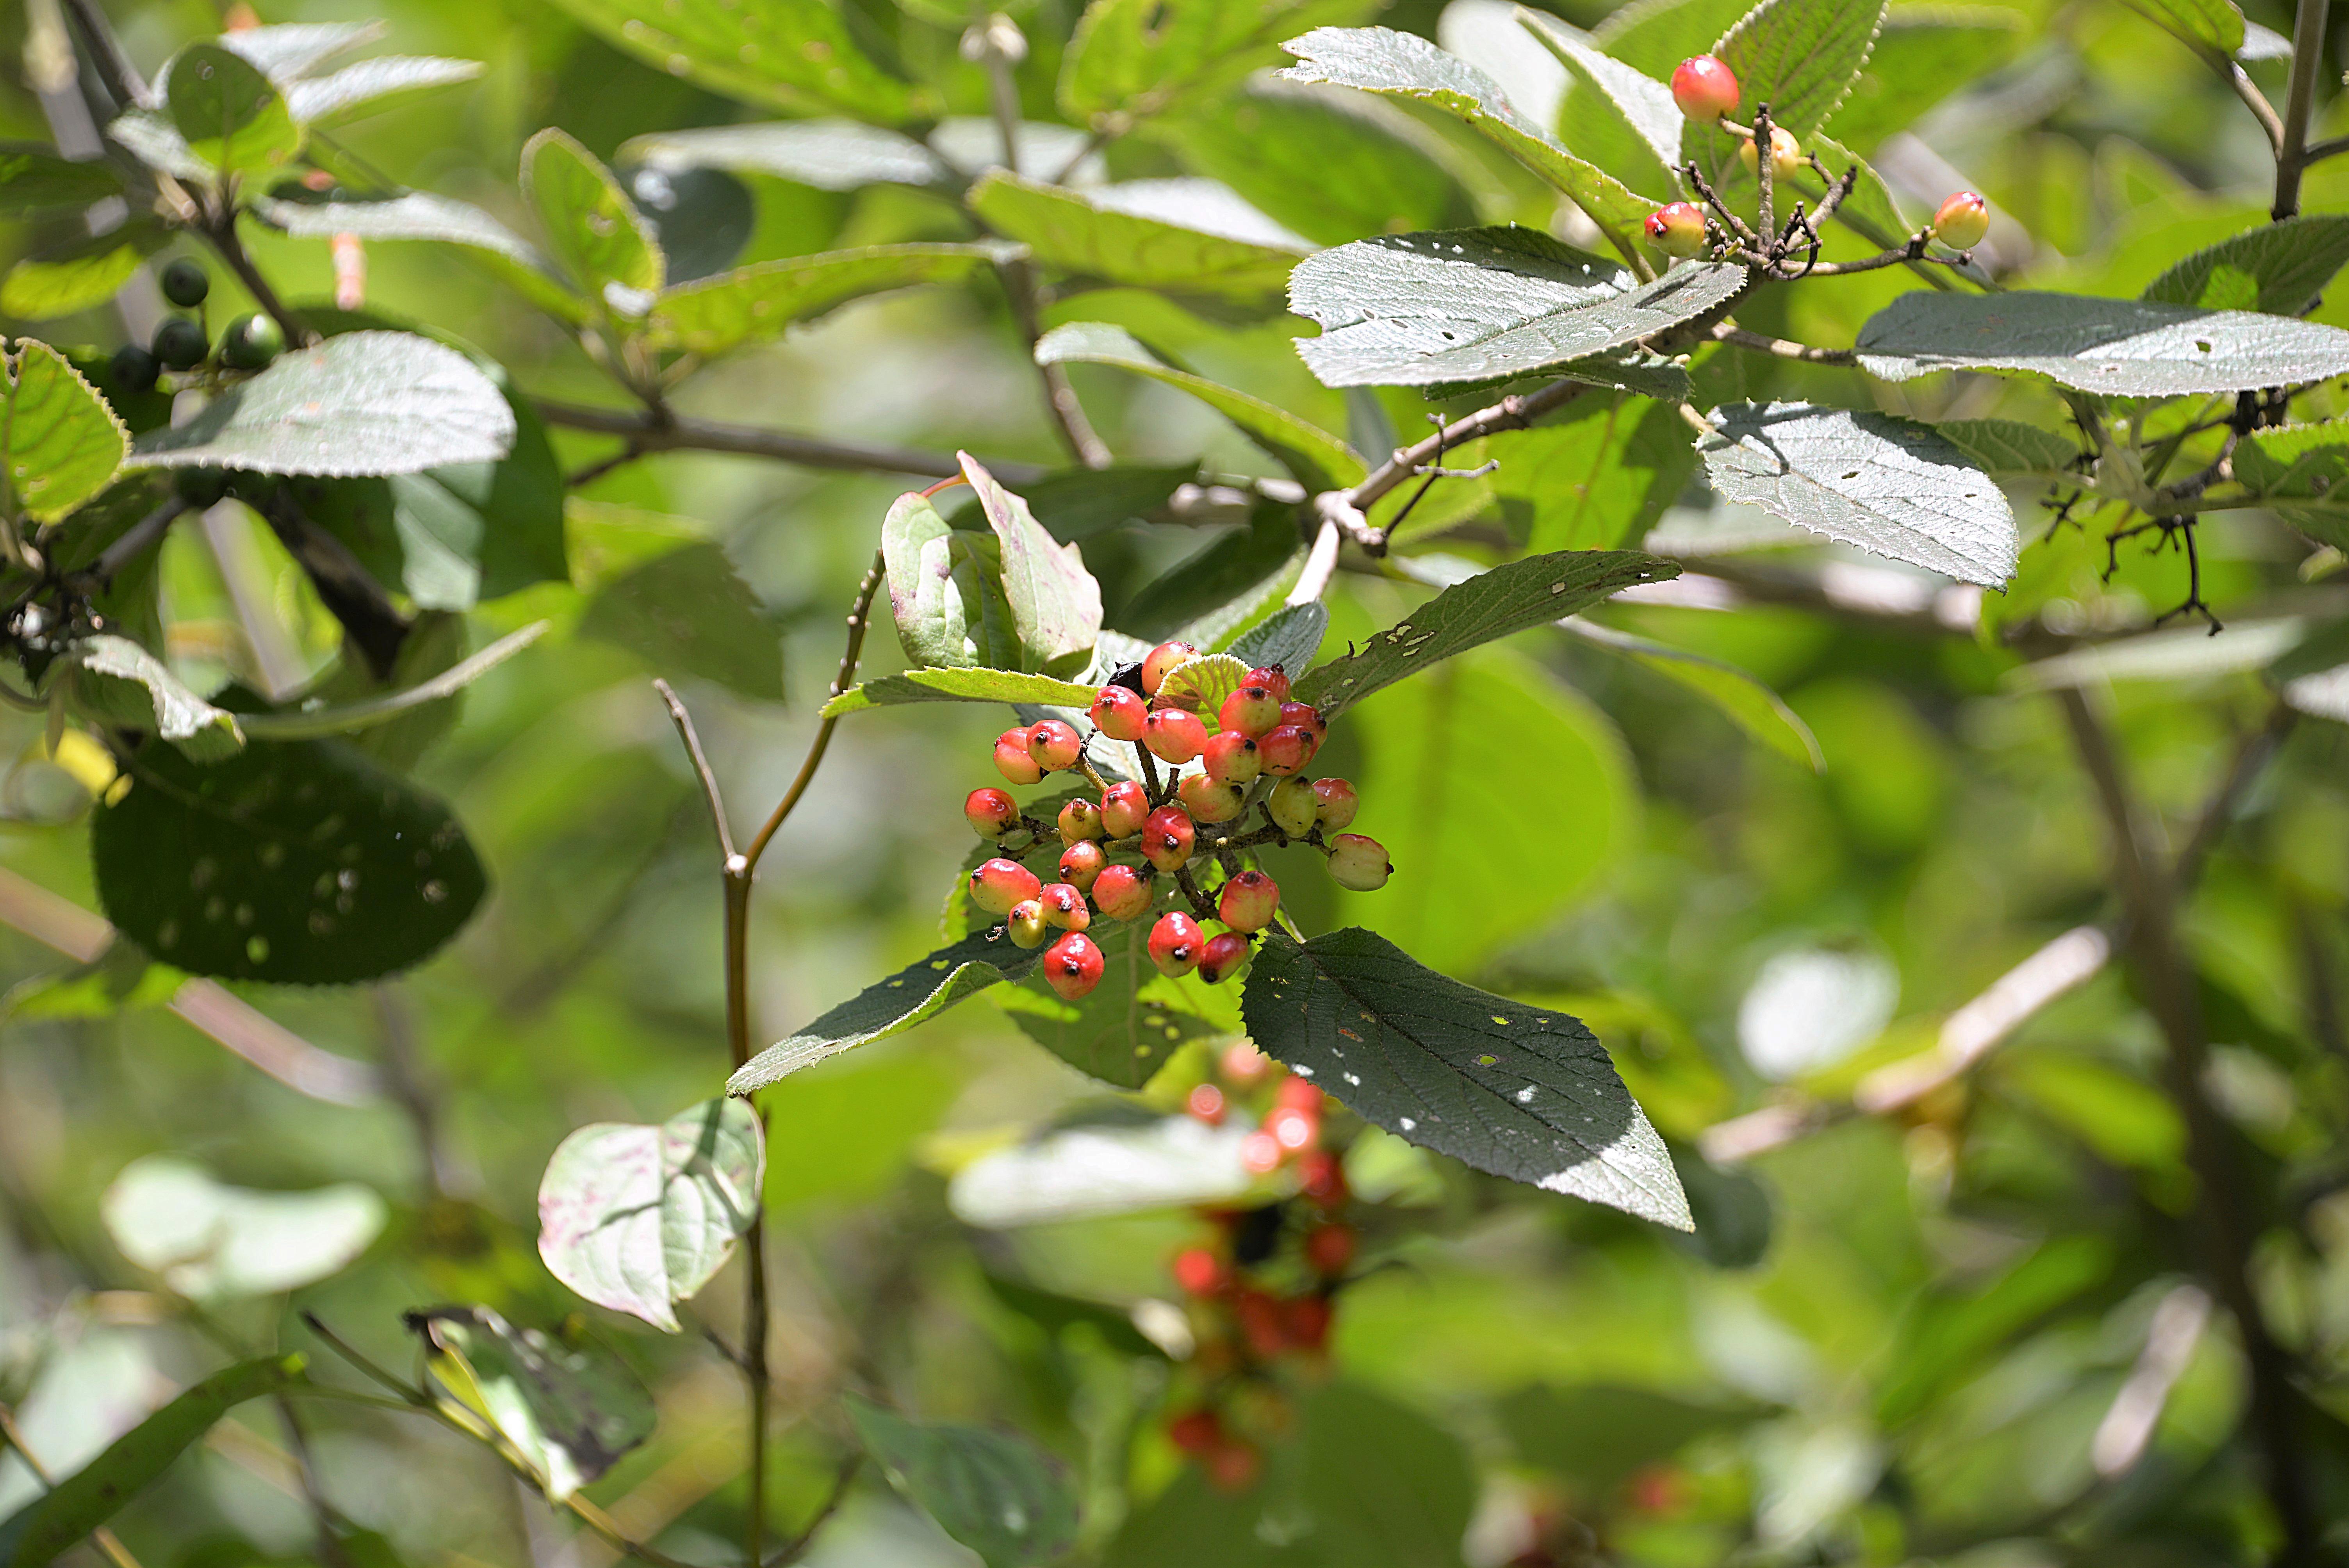 Baum Natur Ast Blühen Pflanze Frucht Beere Blatt Blume Lebensmittel Grün Rot Produzieren Immergrün Botanik Flora